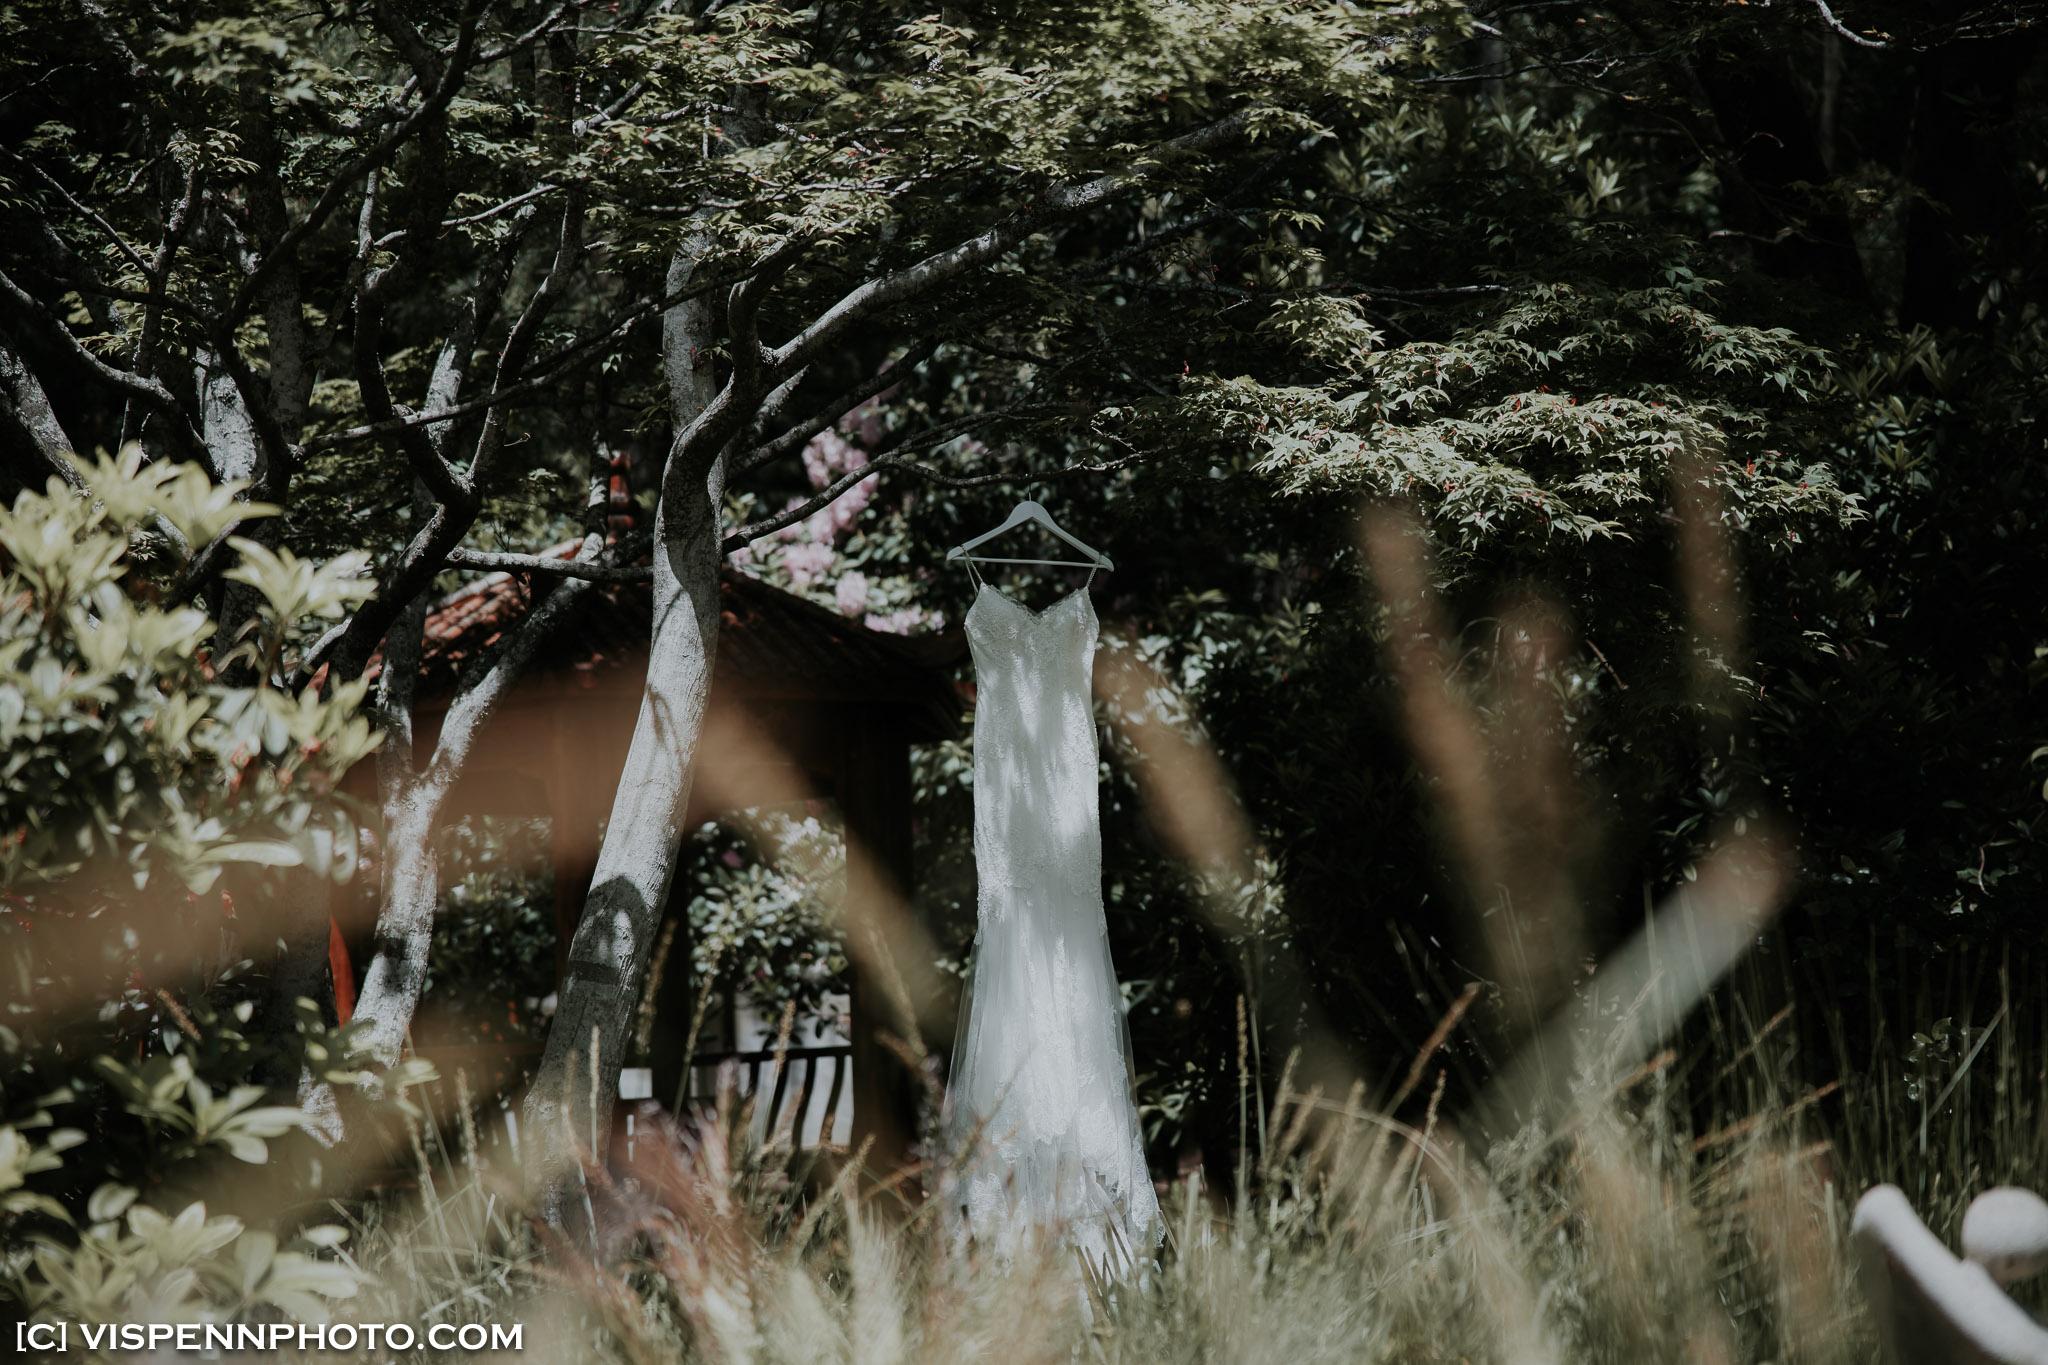 WEDDING DAY Photography Melbourne ElitaPB 03930 1P EOSR ZHPENN